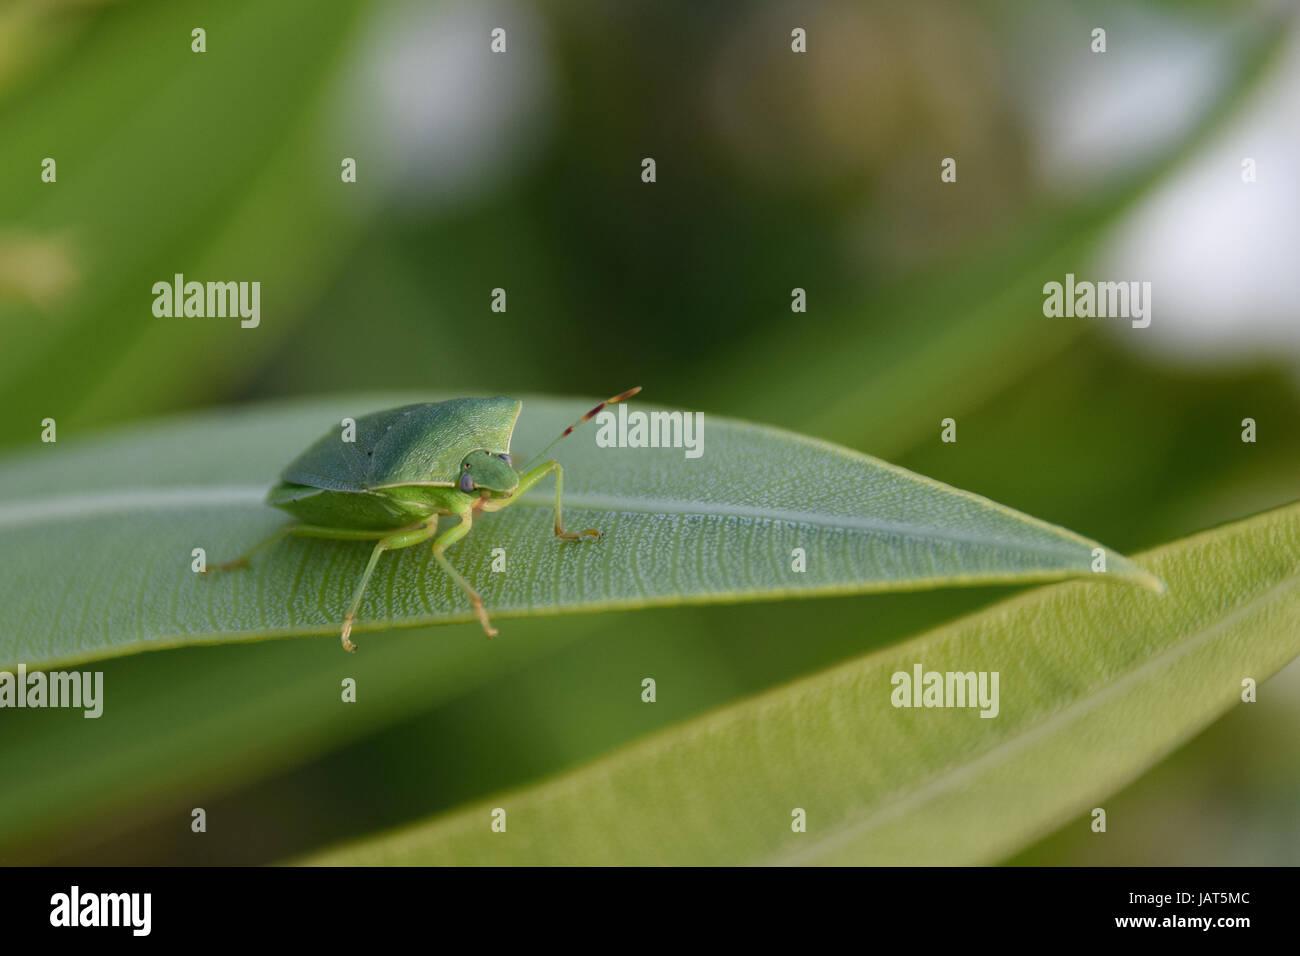 Green shield bug (Palomena prasina) adult on a leaf in Porto Santo, Portugal - Stock Image